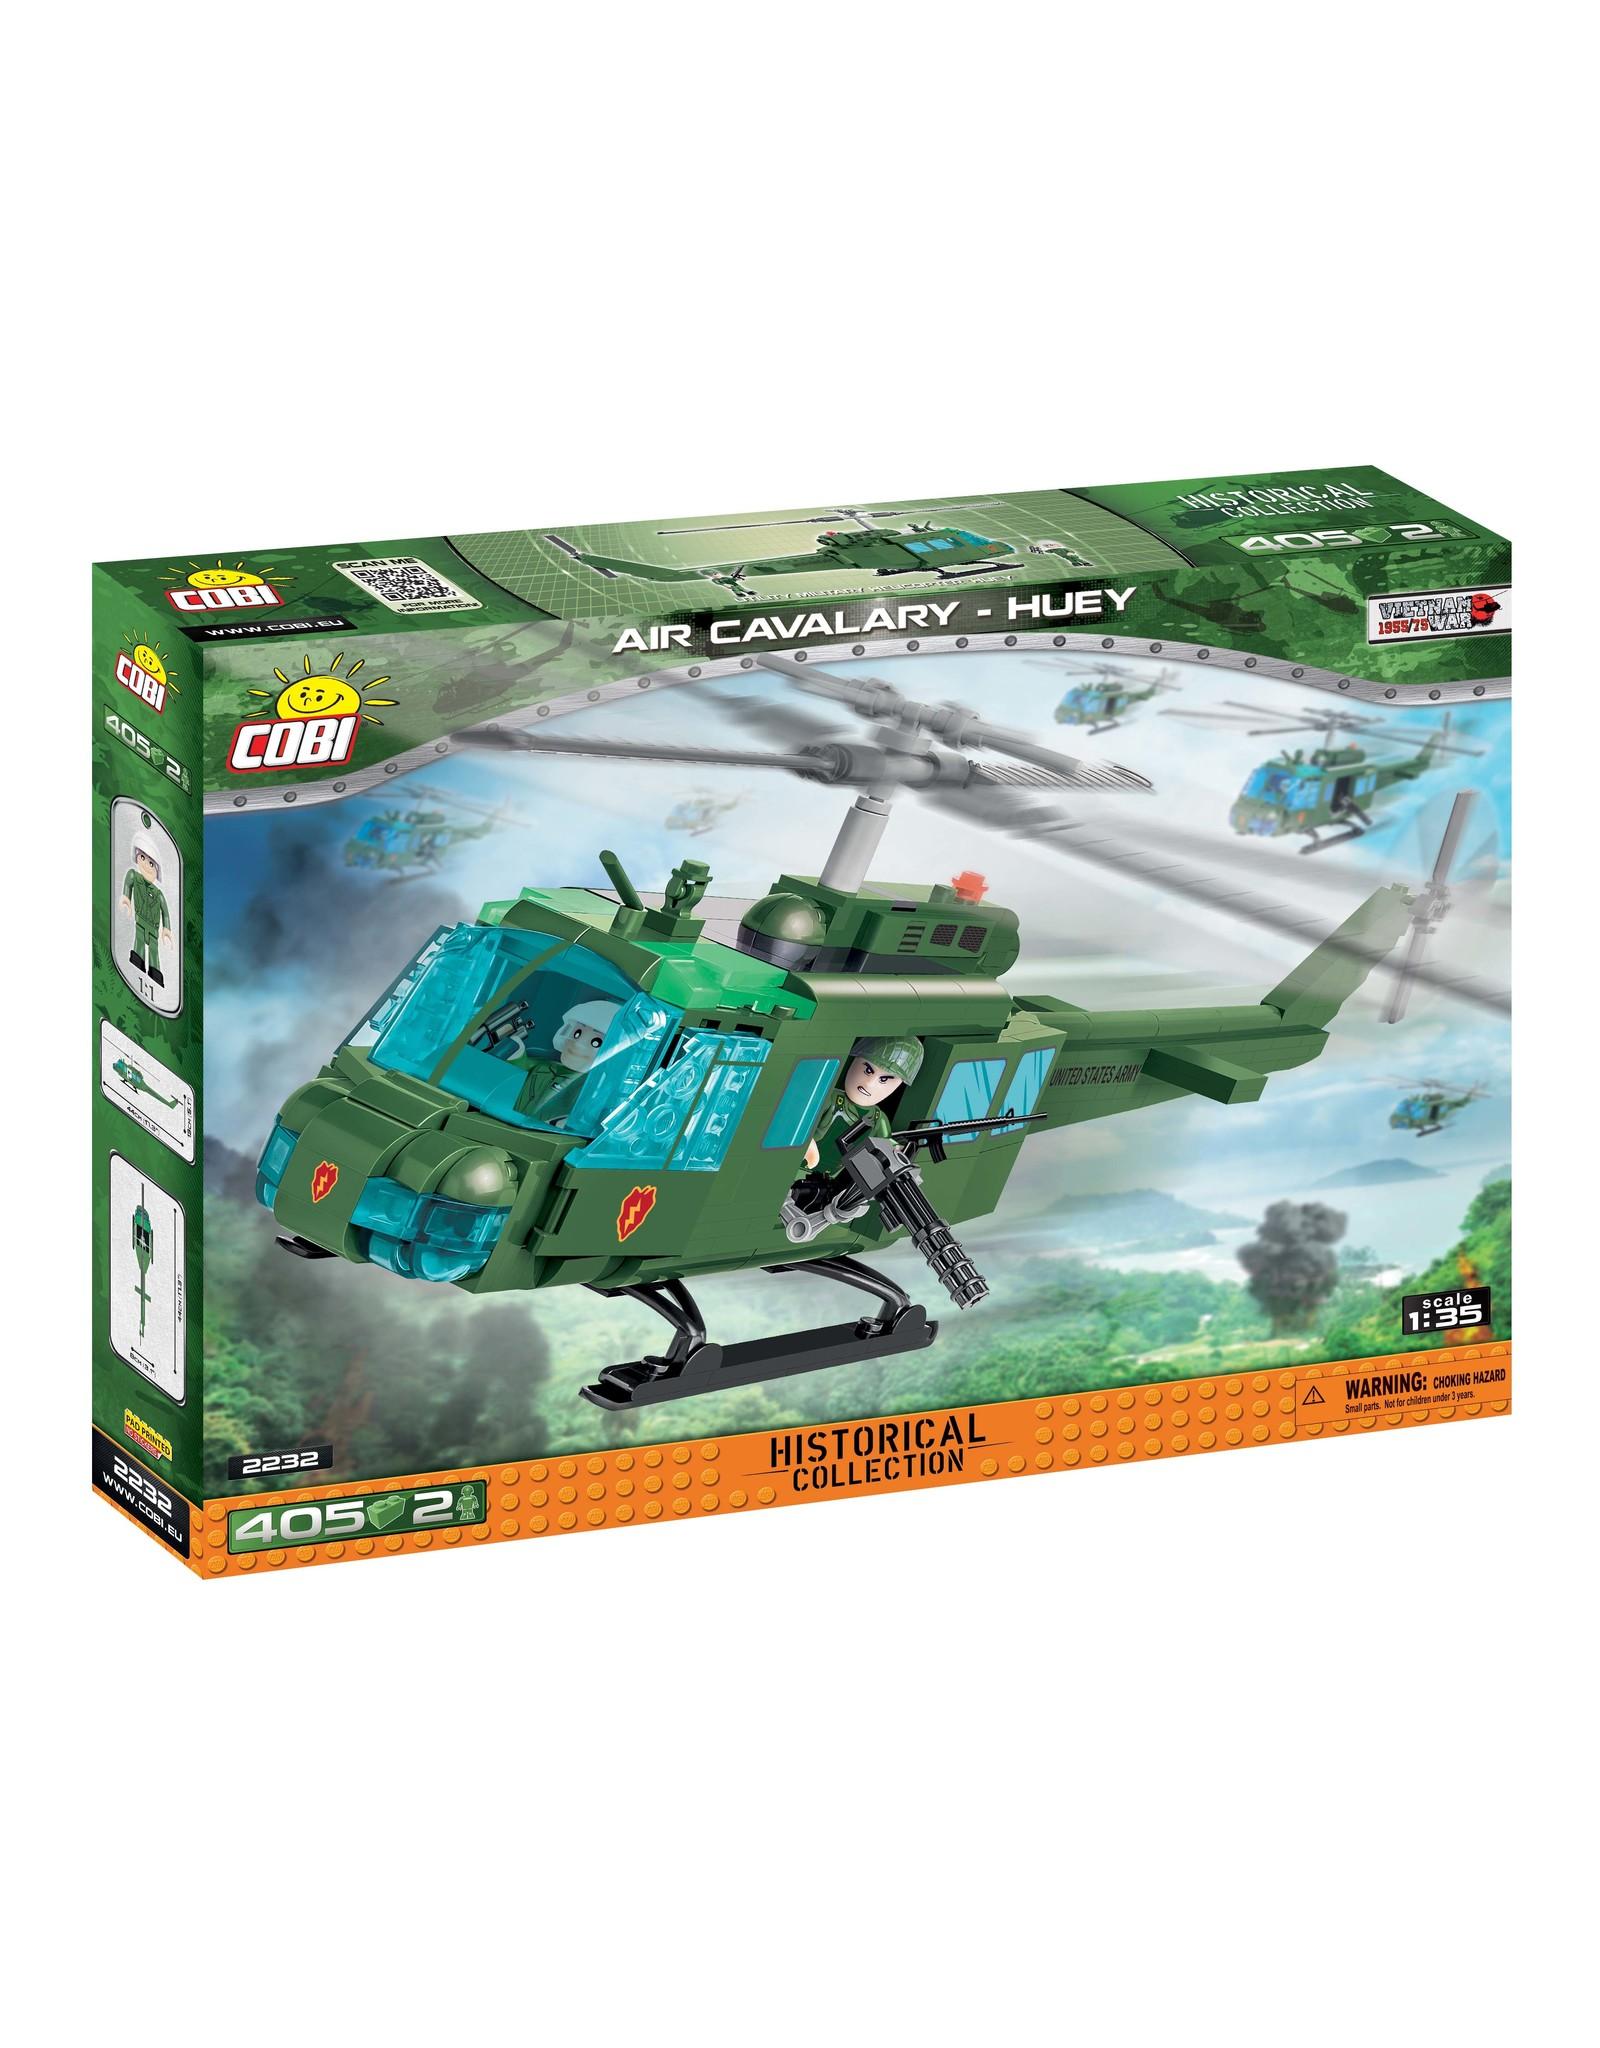 COBI COBI 2232 Air Cavalary Huey